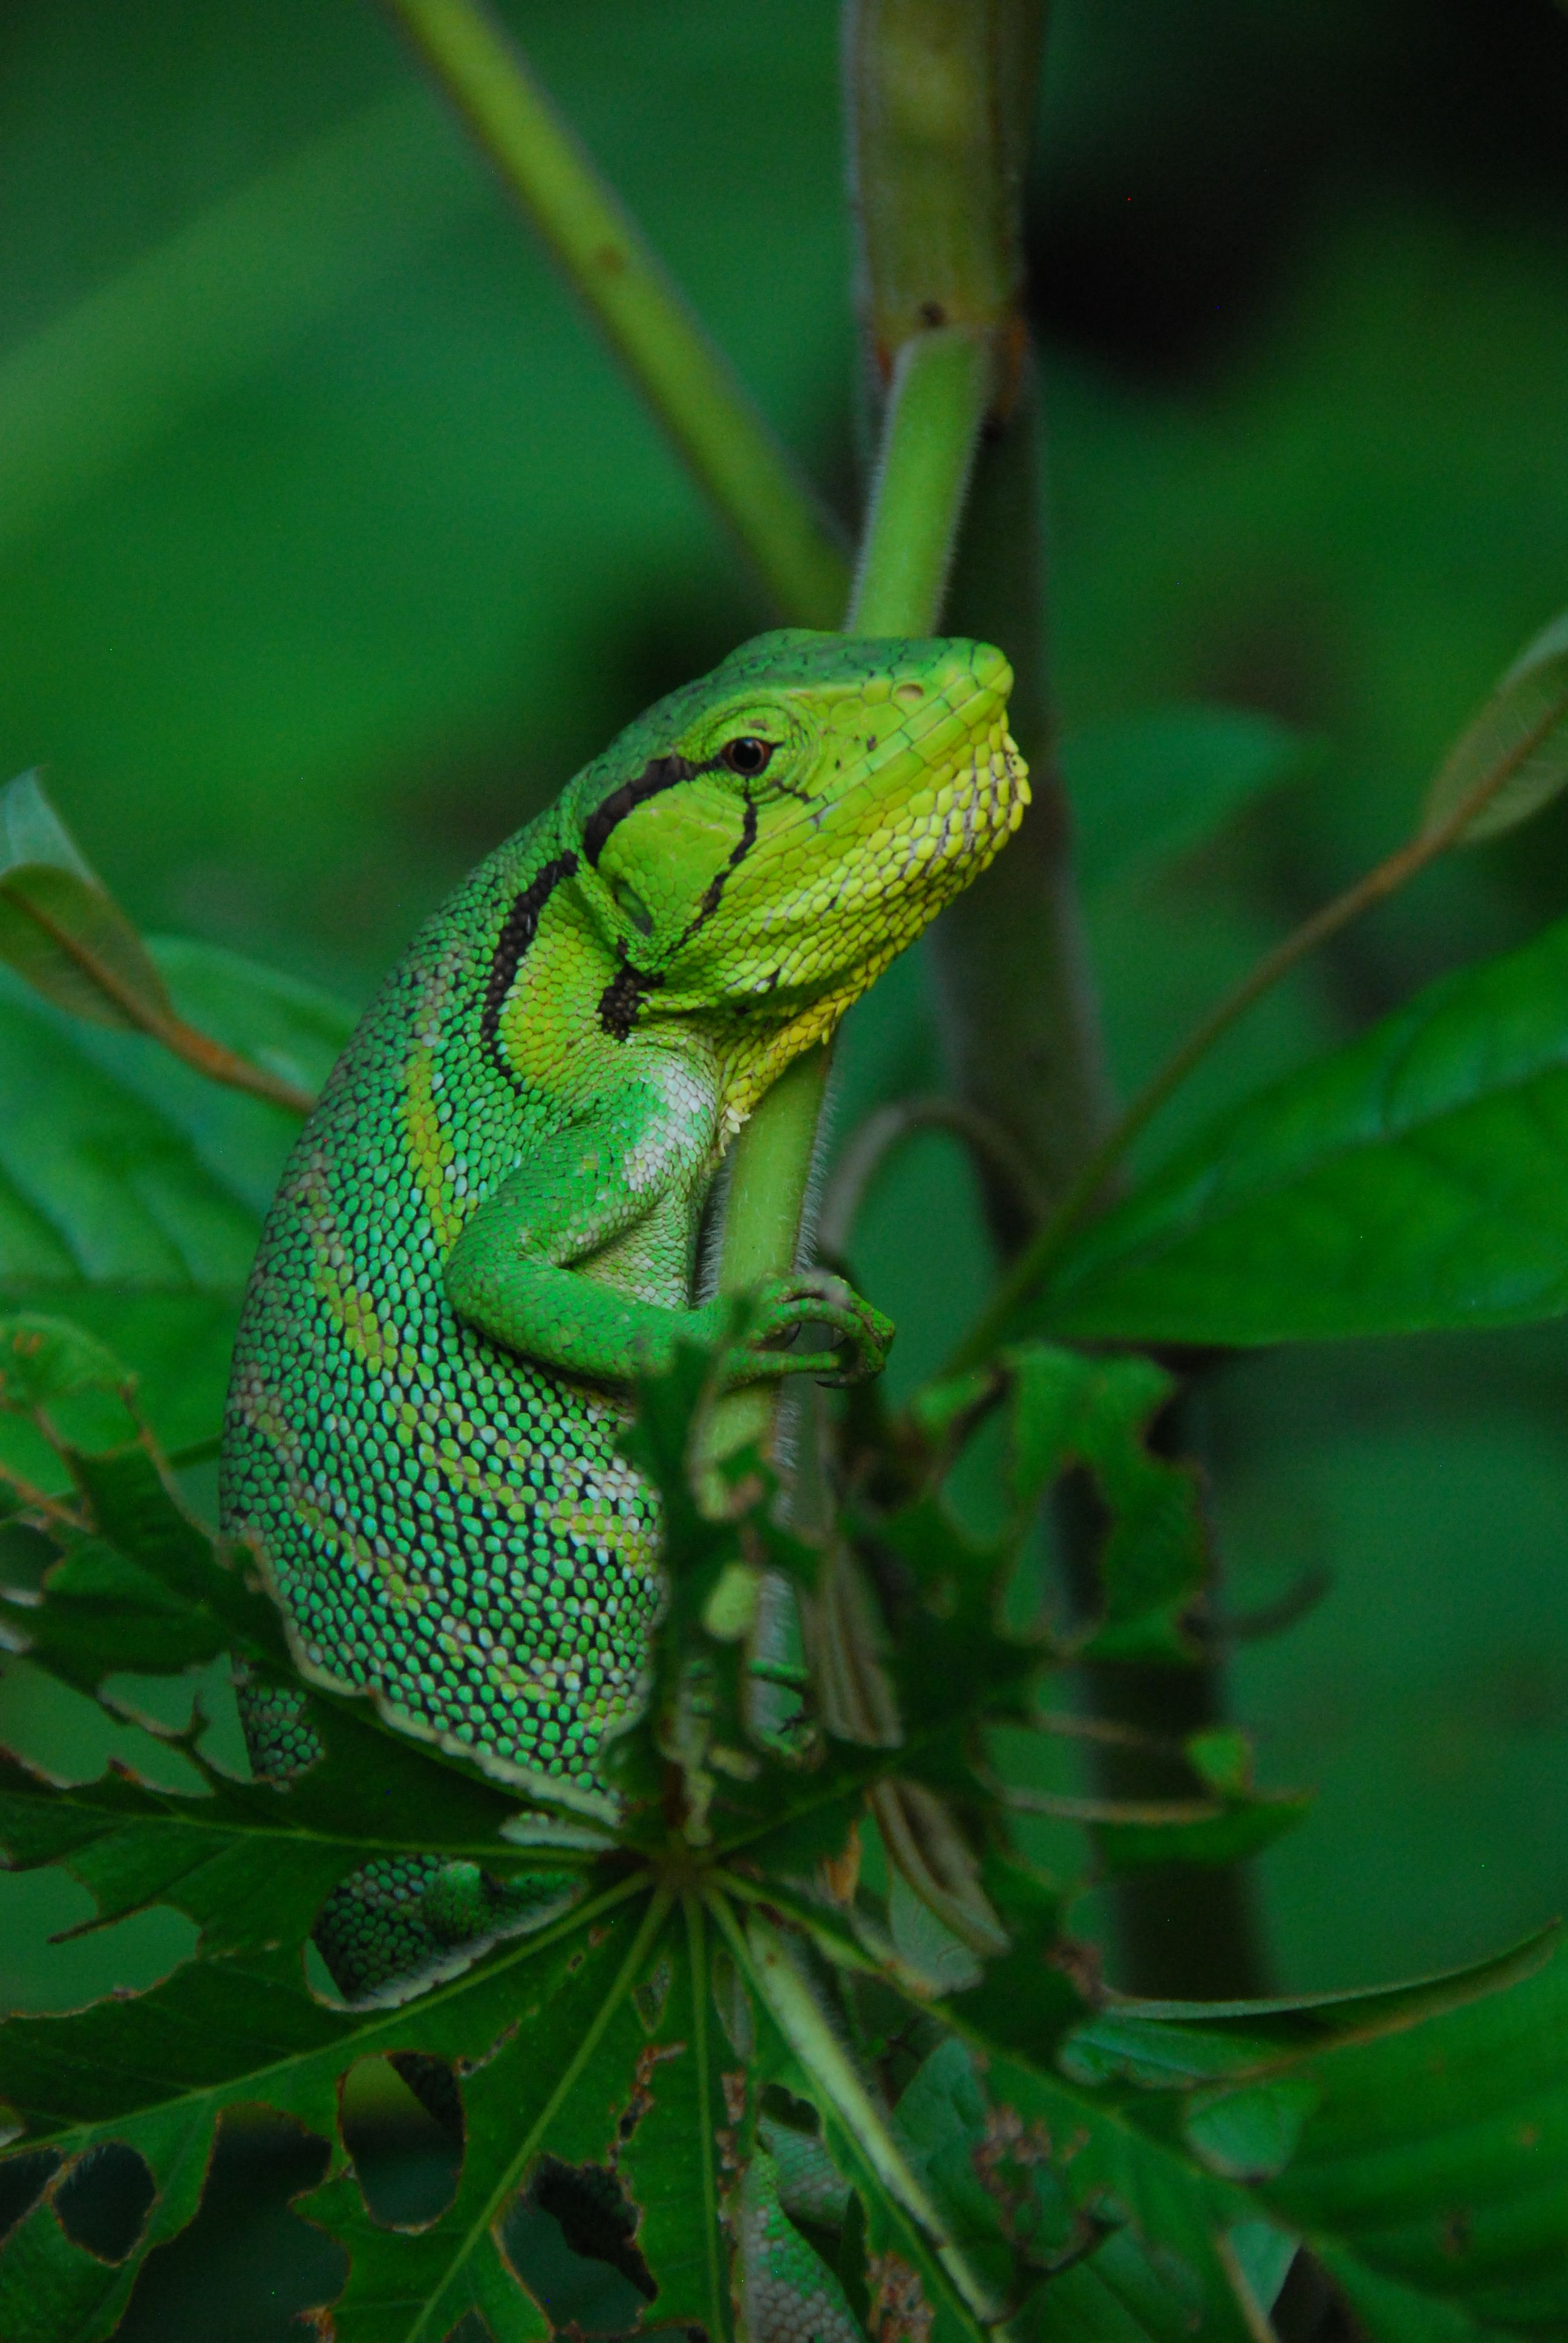 south american rainforest reptiles